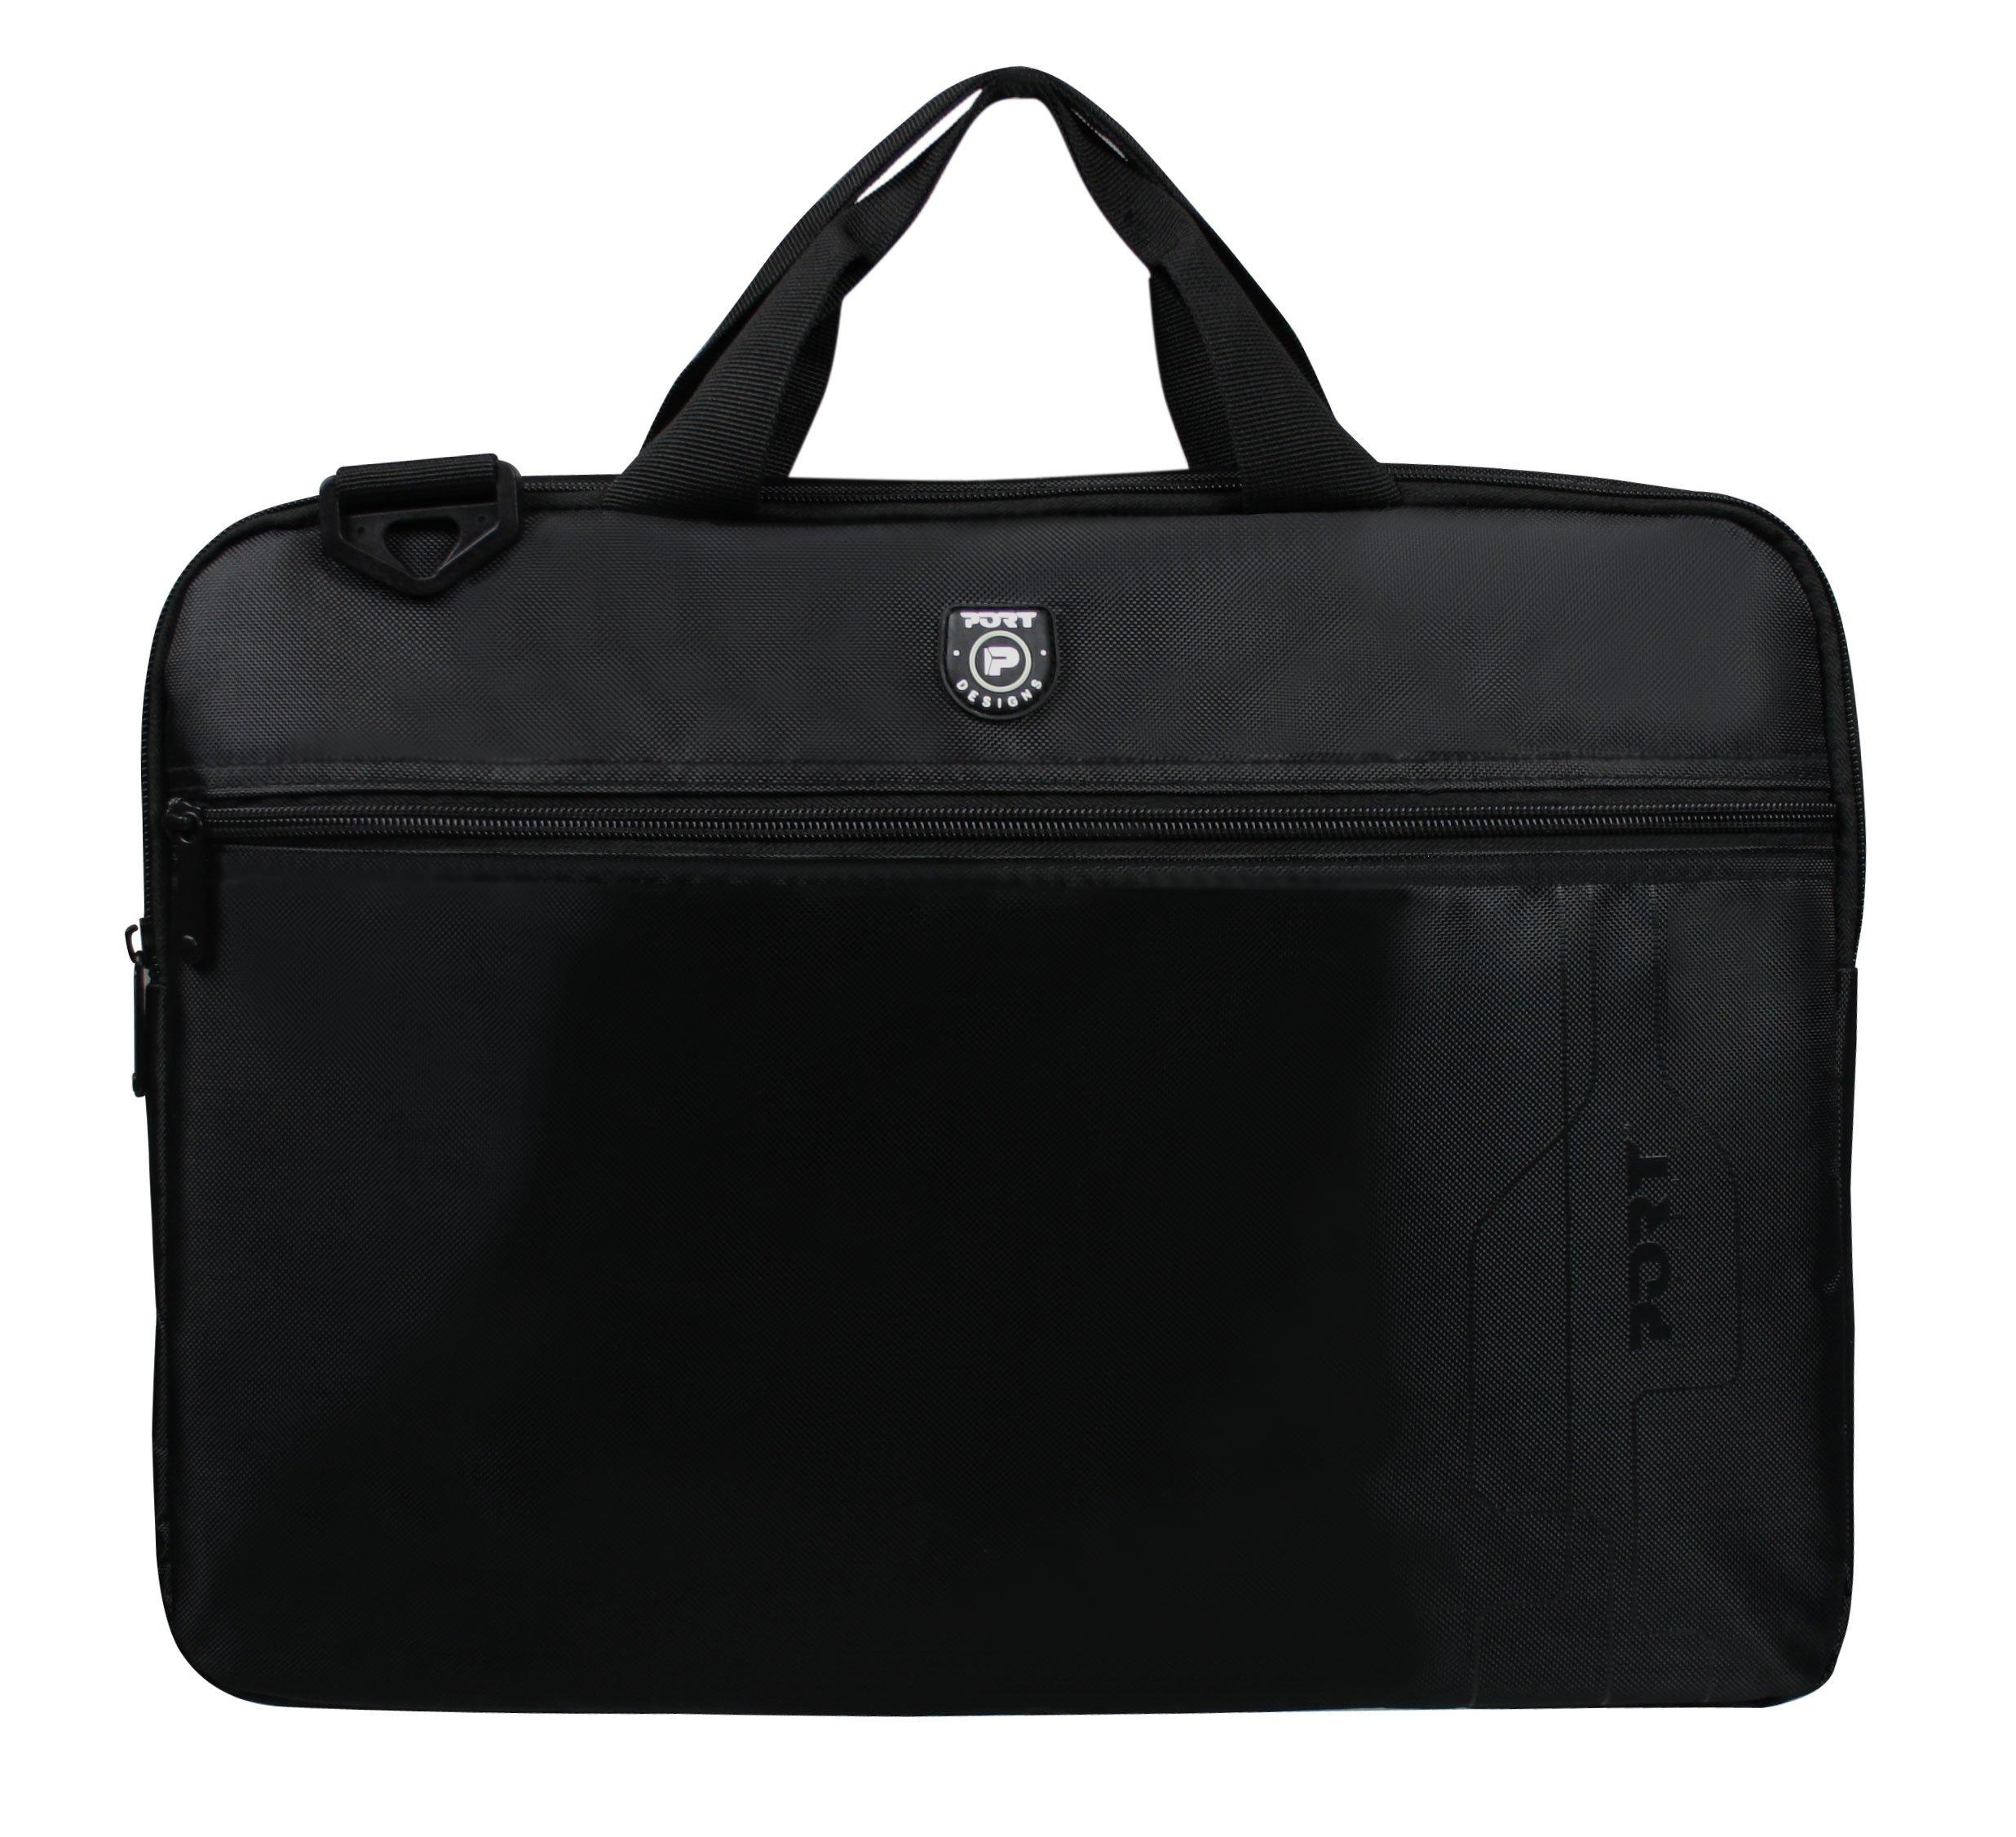 81k7cDkn%2BWL - Port Designs 202310 maletines para portátil - Funda (Mochila, Negro, Monótono, Nylon, Resistente al Polvo, Resistente a rayones)